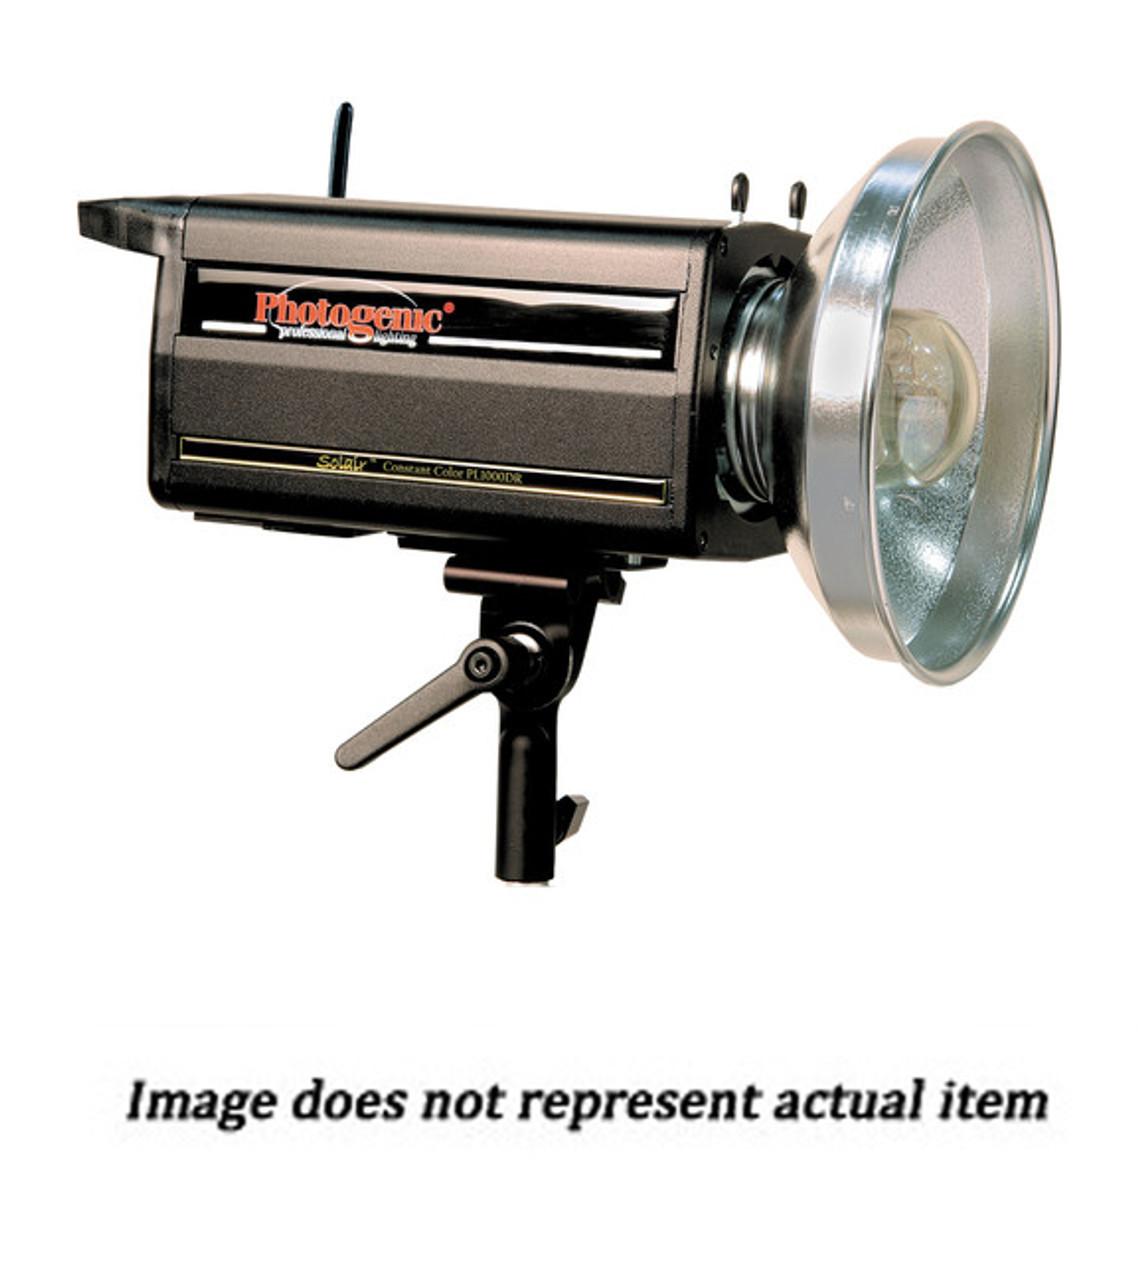 Photogenic Photogenic PLR1000DRC Radio Solair 1,000W/s Monolight with PocketWizard Receiver (USED) - S/N 008979